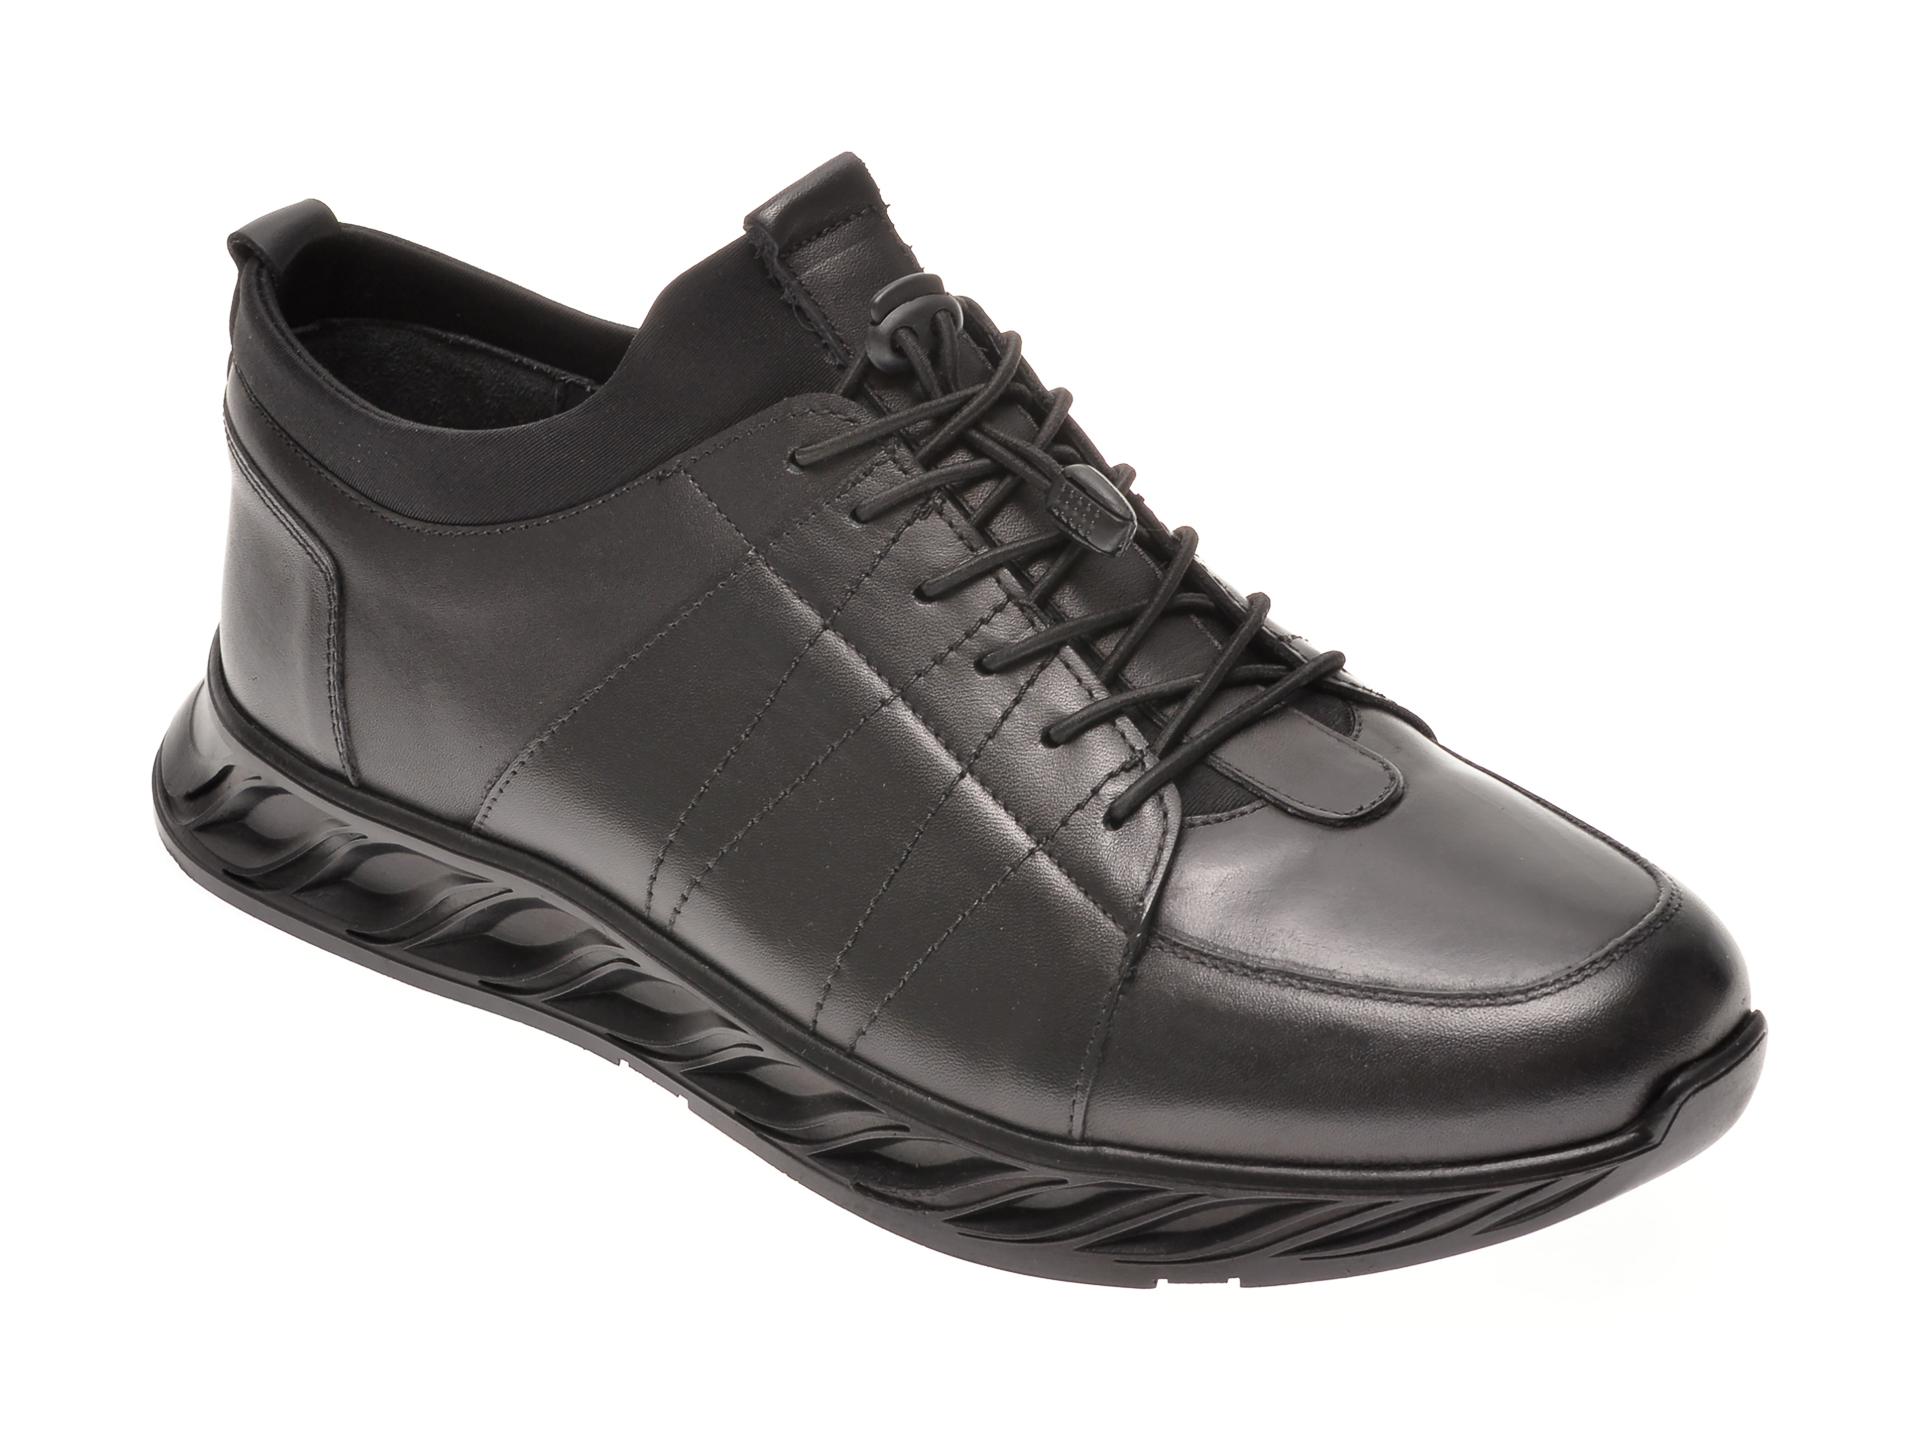 Pantofi Otter Negri, 30904, Din Piele Naturala